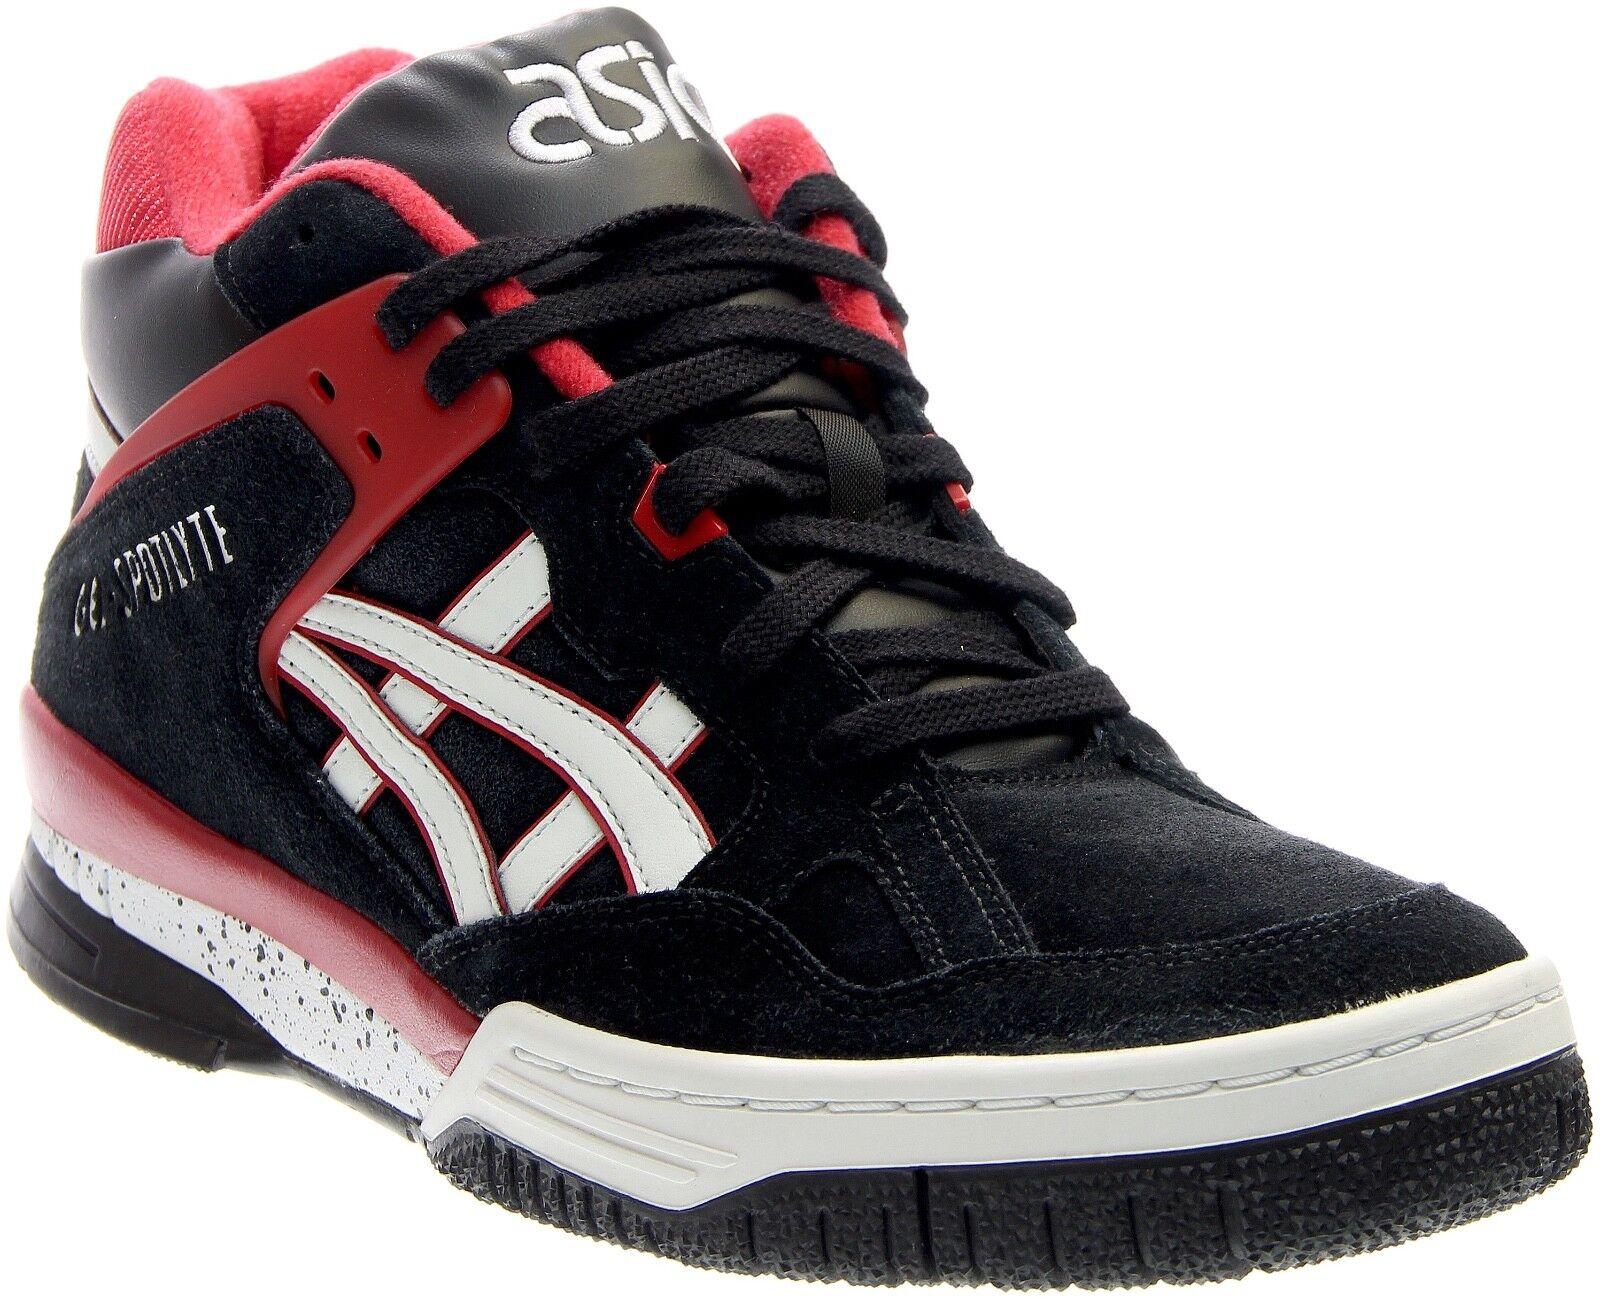 Mens Asics Gel Spotlyte High Top Sneakers - Black White Red [H525L 9001]